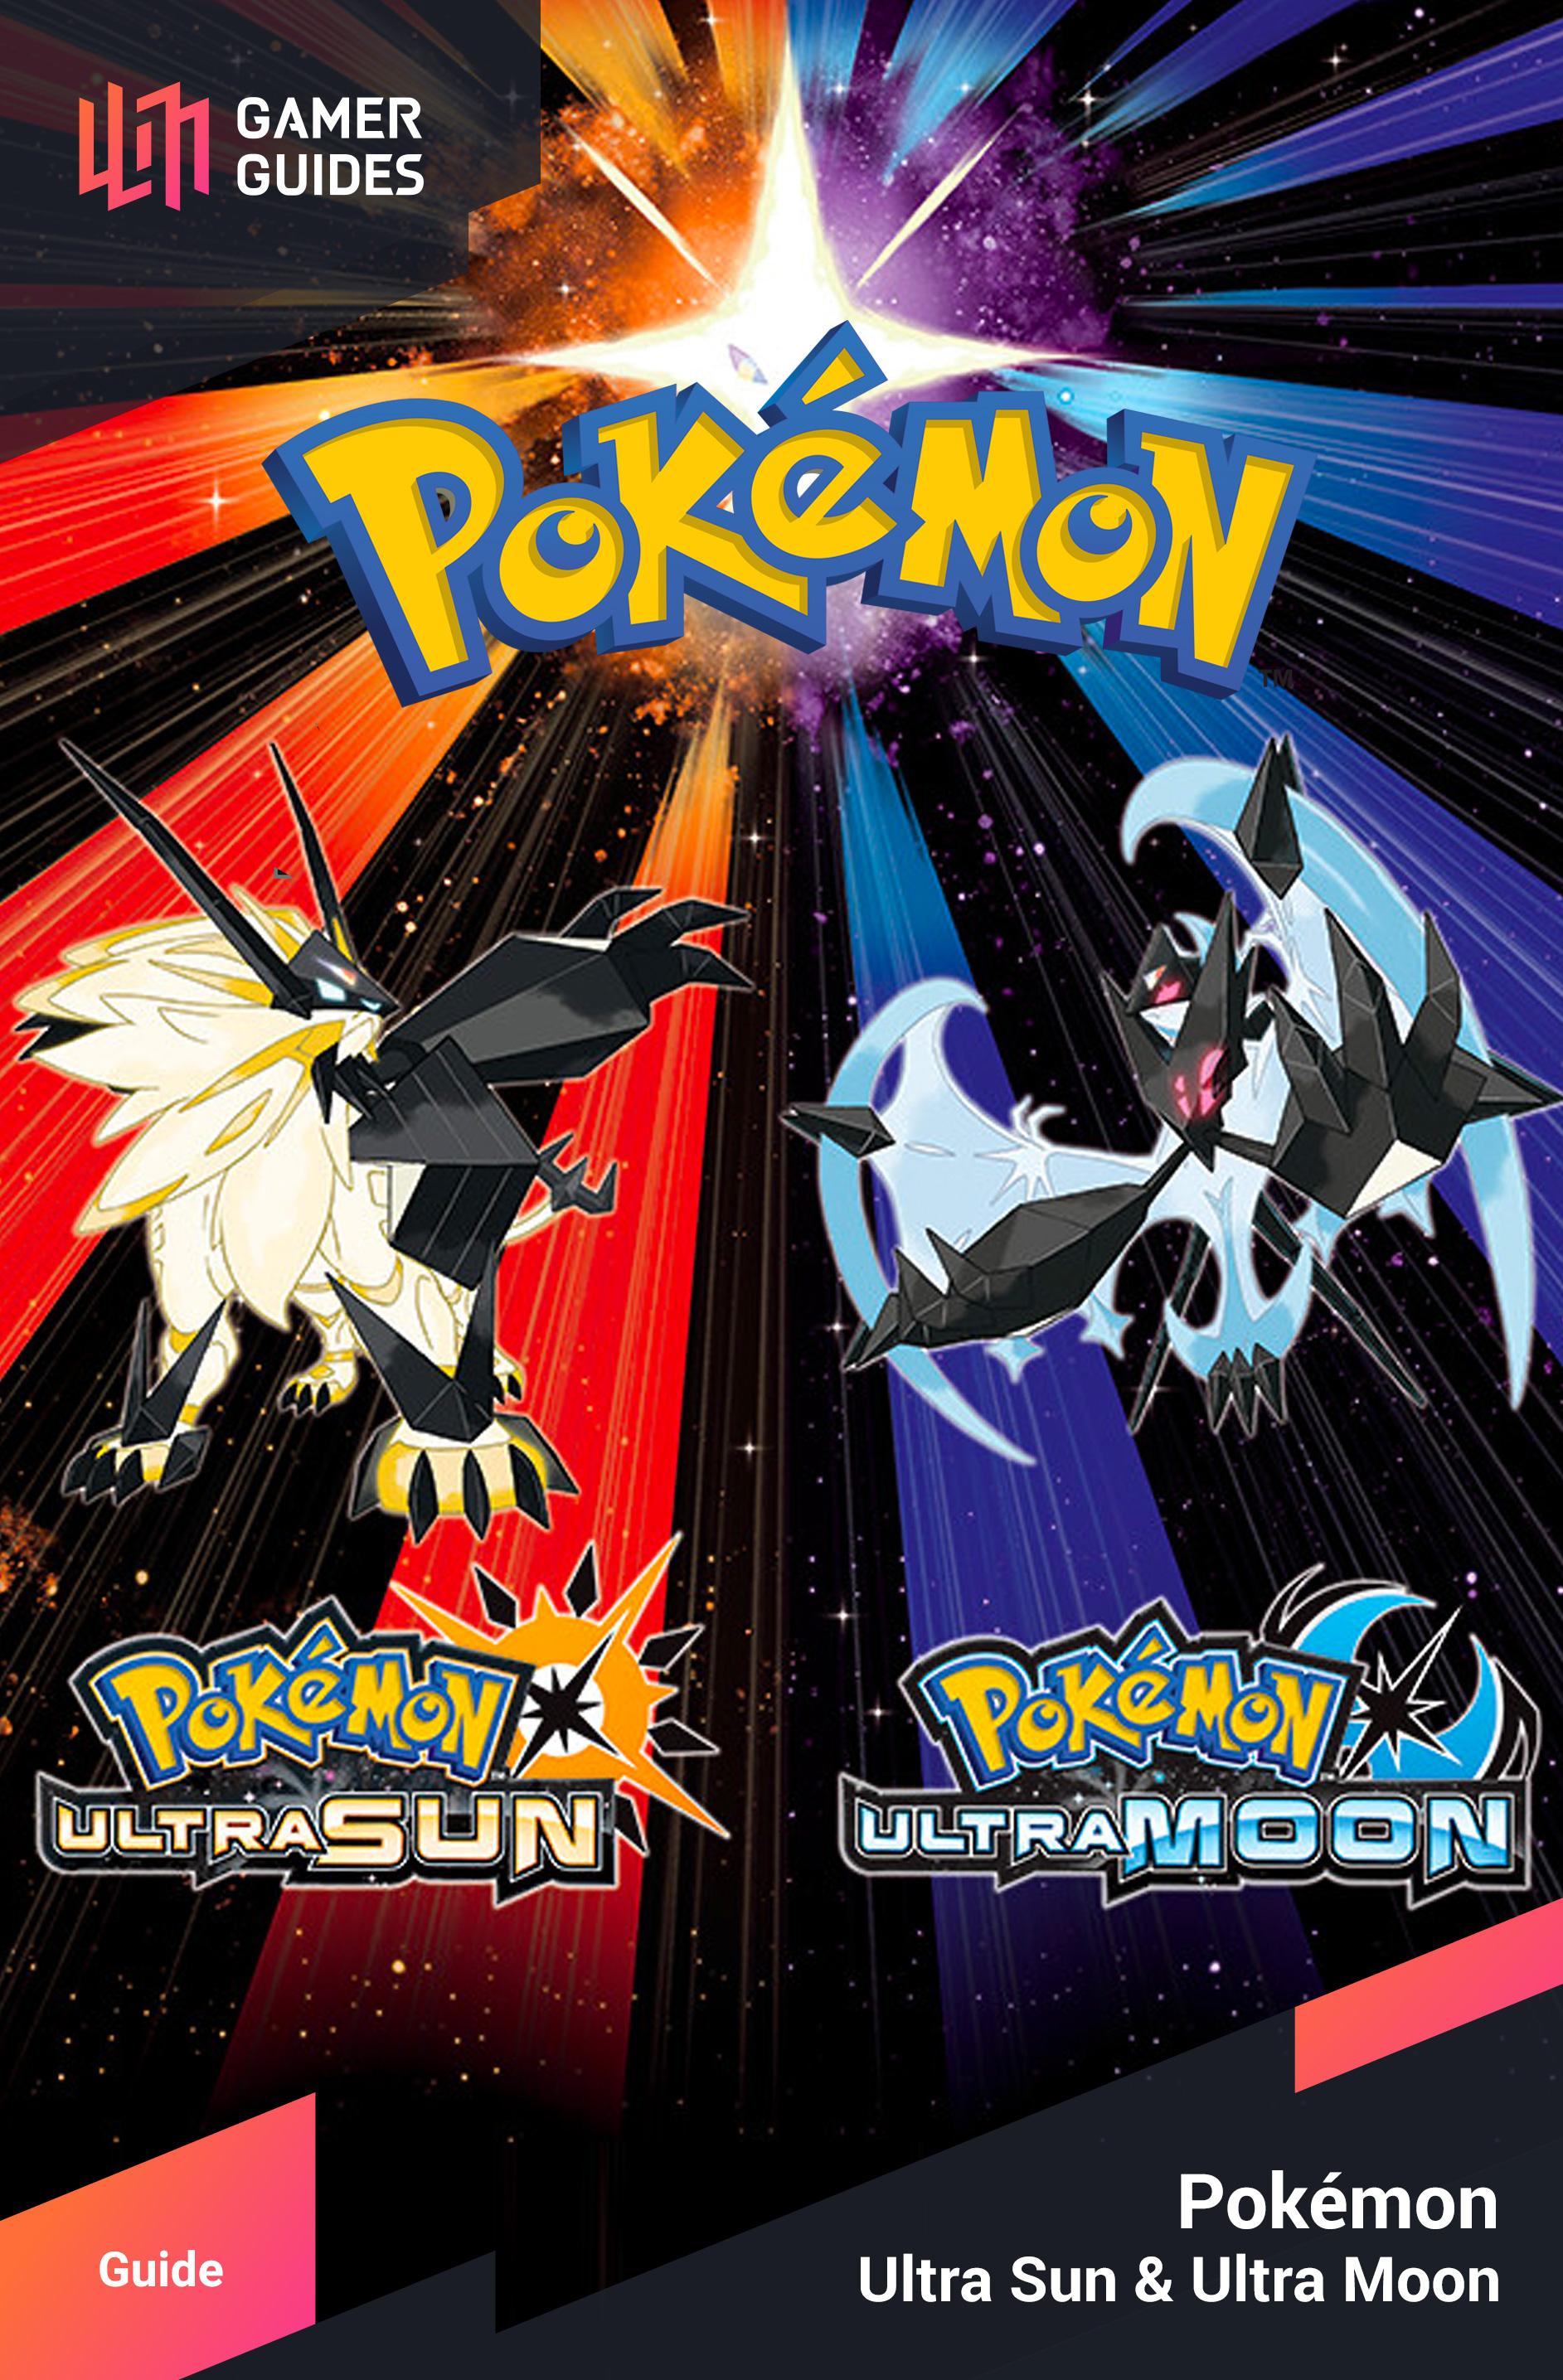 Pokémon: Ultra Sun & Moon | Gamer Guides